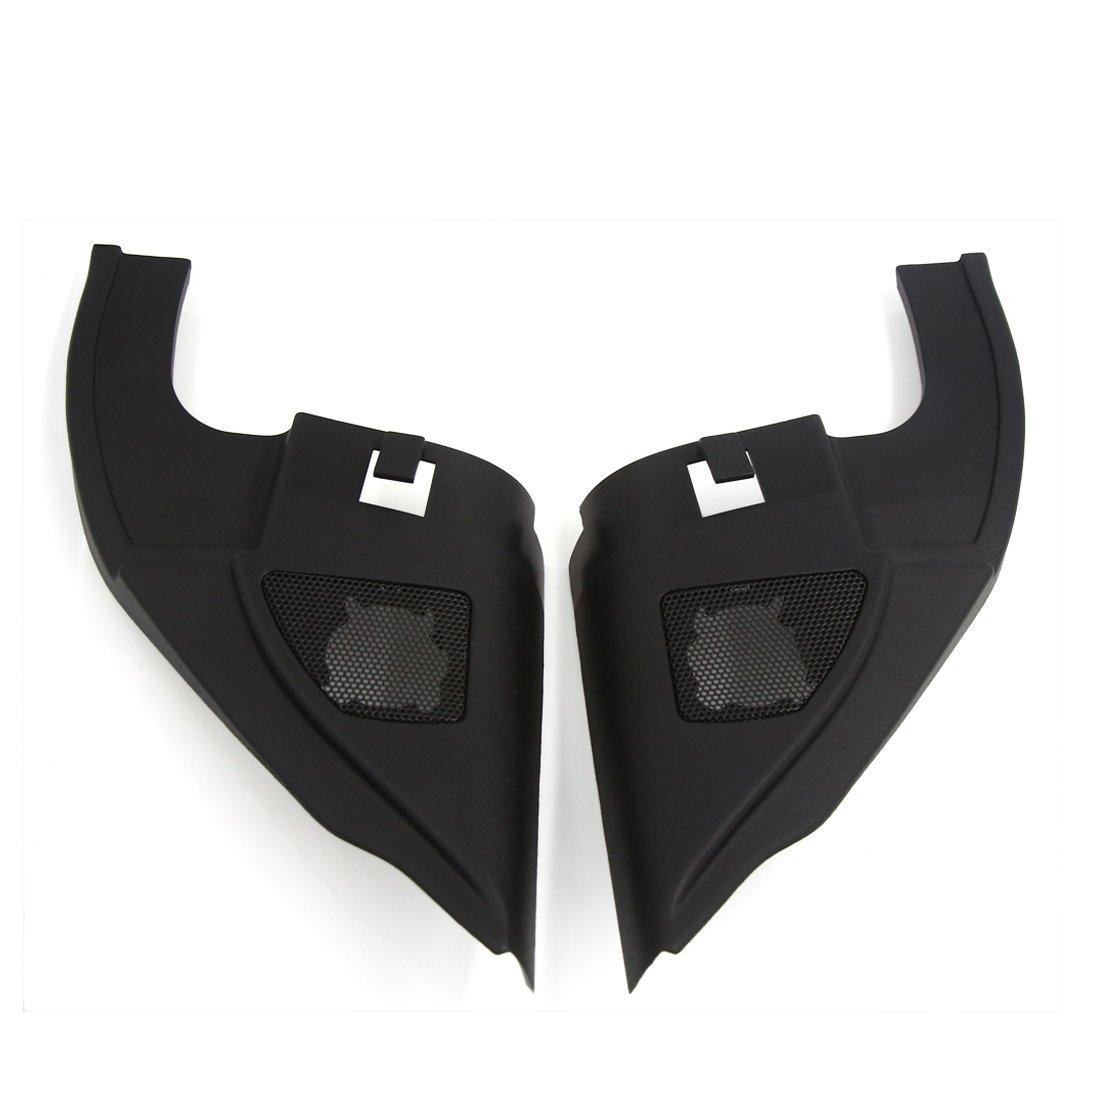 uxcell 2 Pcs 6 x 5.5cm Mesh Black Car Horn Trumpet Dustproof Cover for Nissan Sylphy